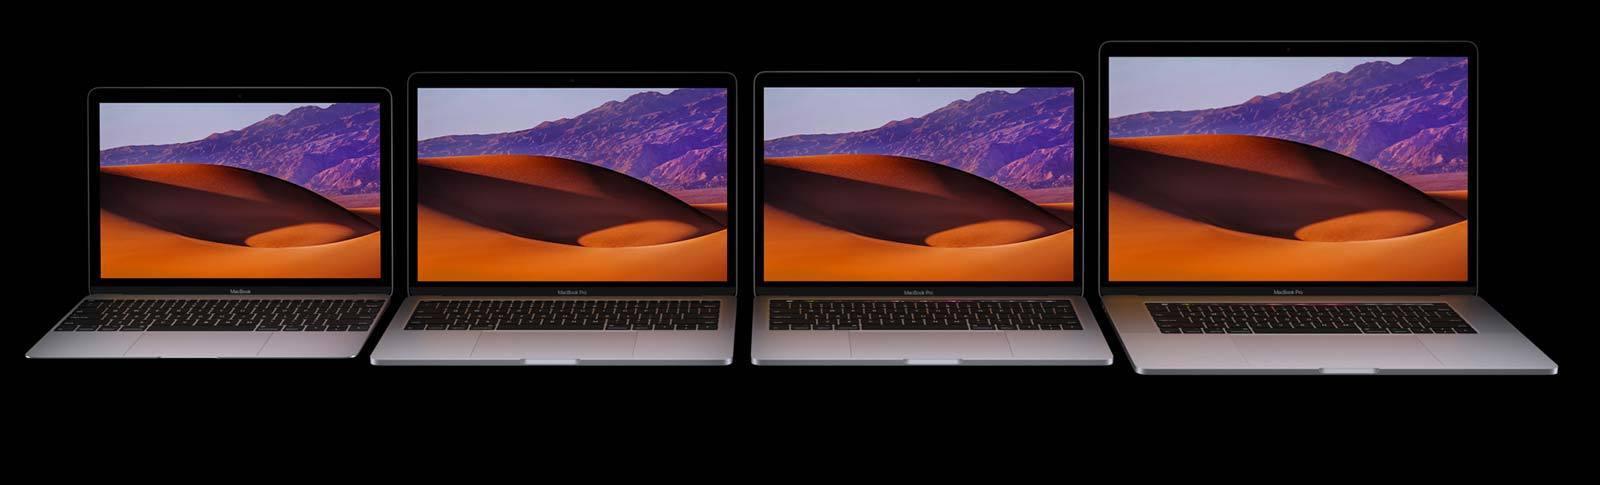 2017 mac laptop family stock